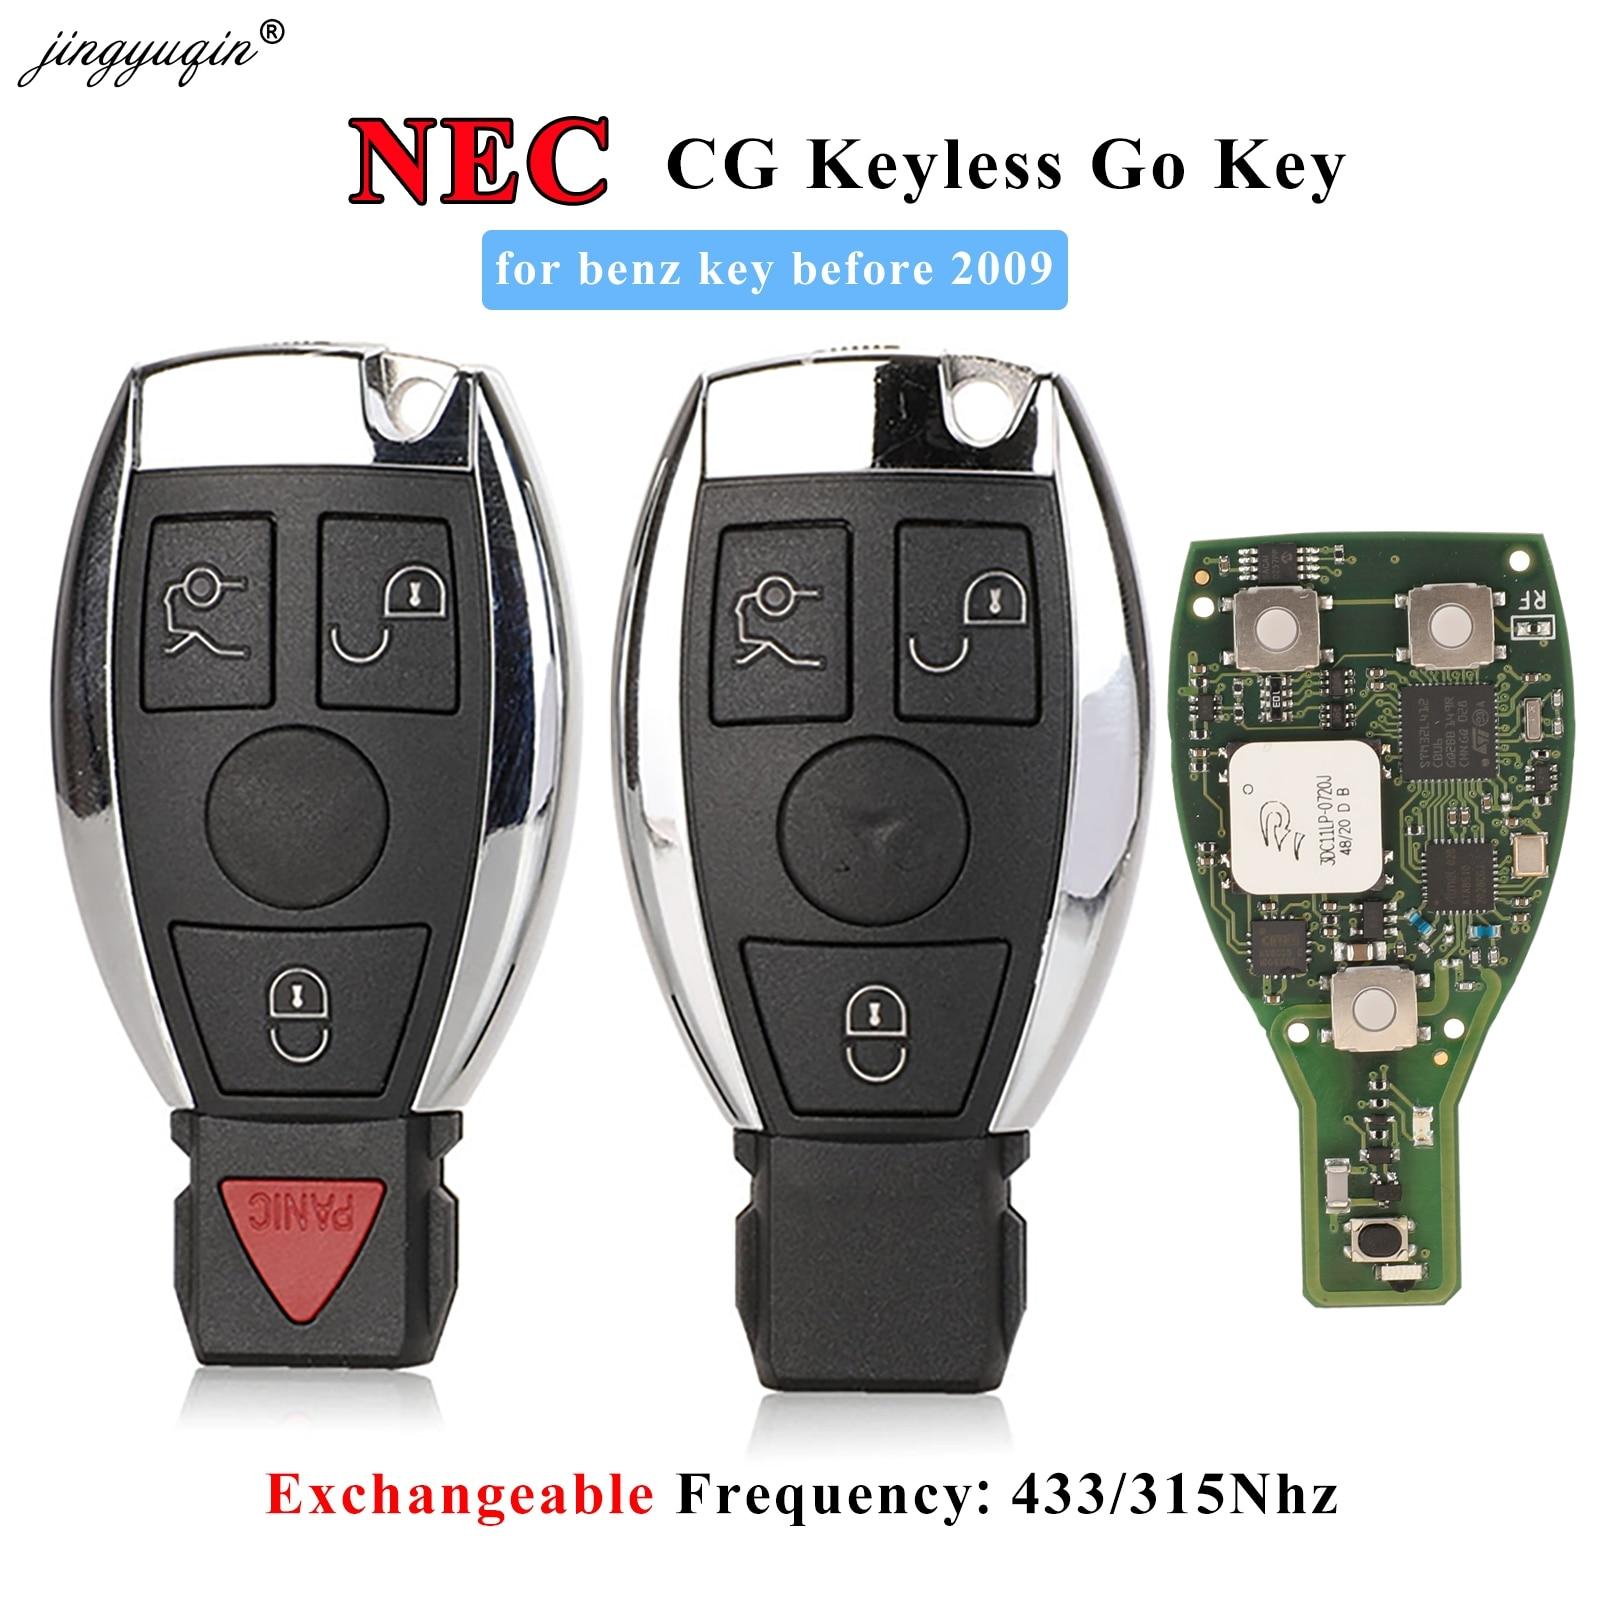 Jingyuqin NEC بدون مفتاح الذهاب البعيد مفتاح فوب 3 زر بغا نمط ترقية لمرسيدس بنز قبل 2009 315mhz 433MHz تبادل CG